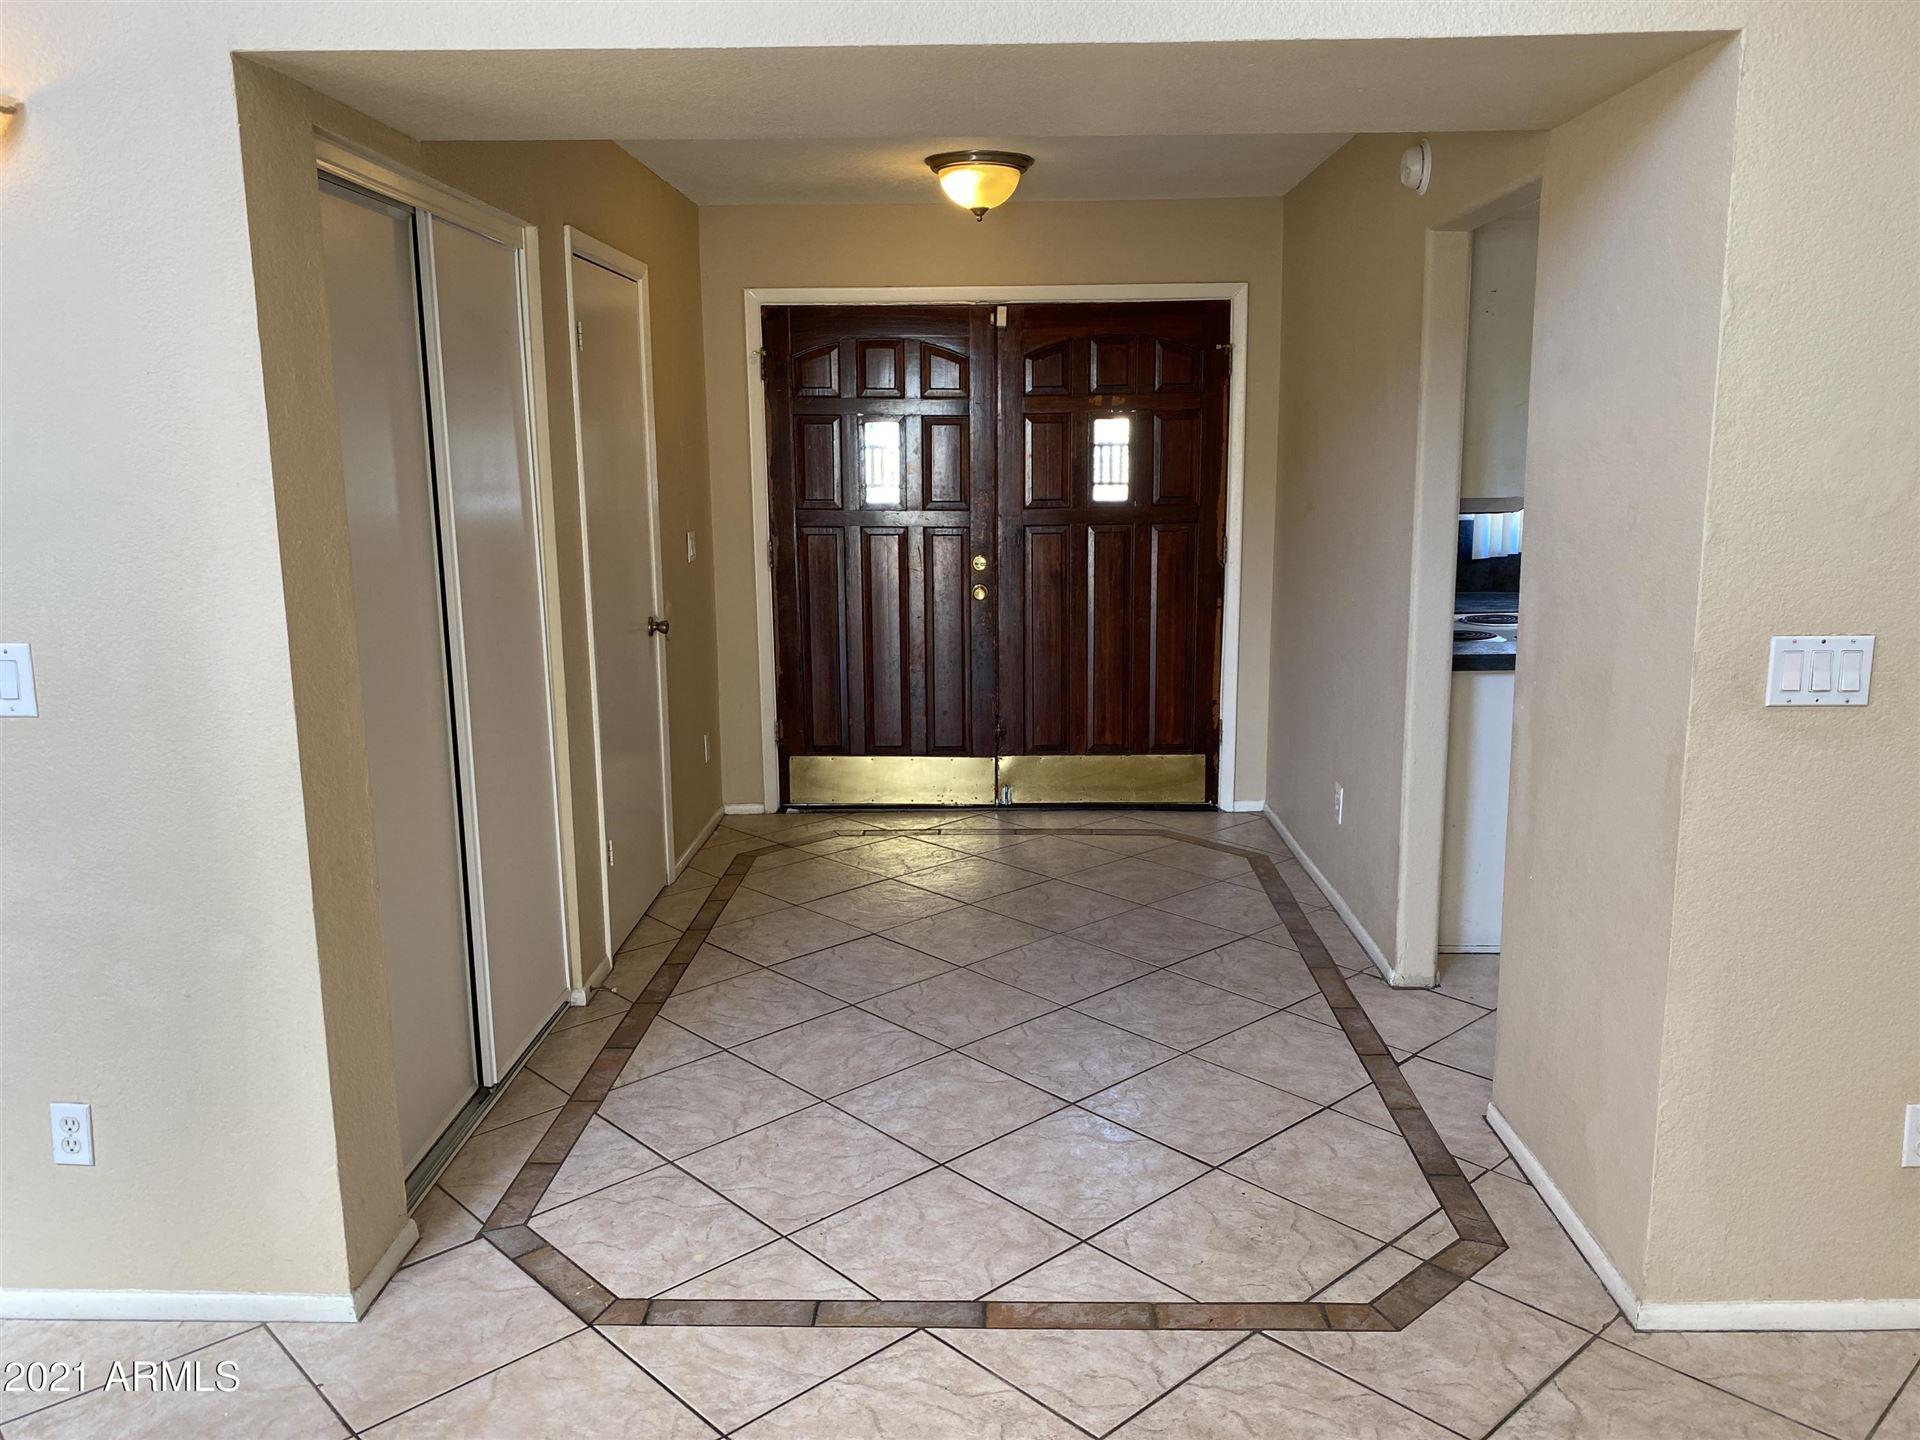 Photo of 6337 W TURQUOISE Avenue, Glendale, AZ 85302 (MLS # 6200279)